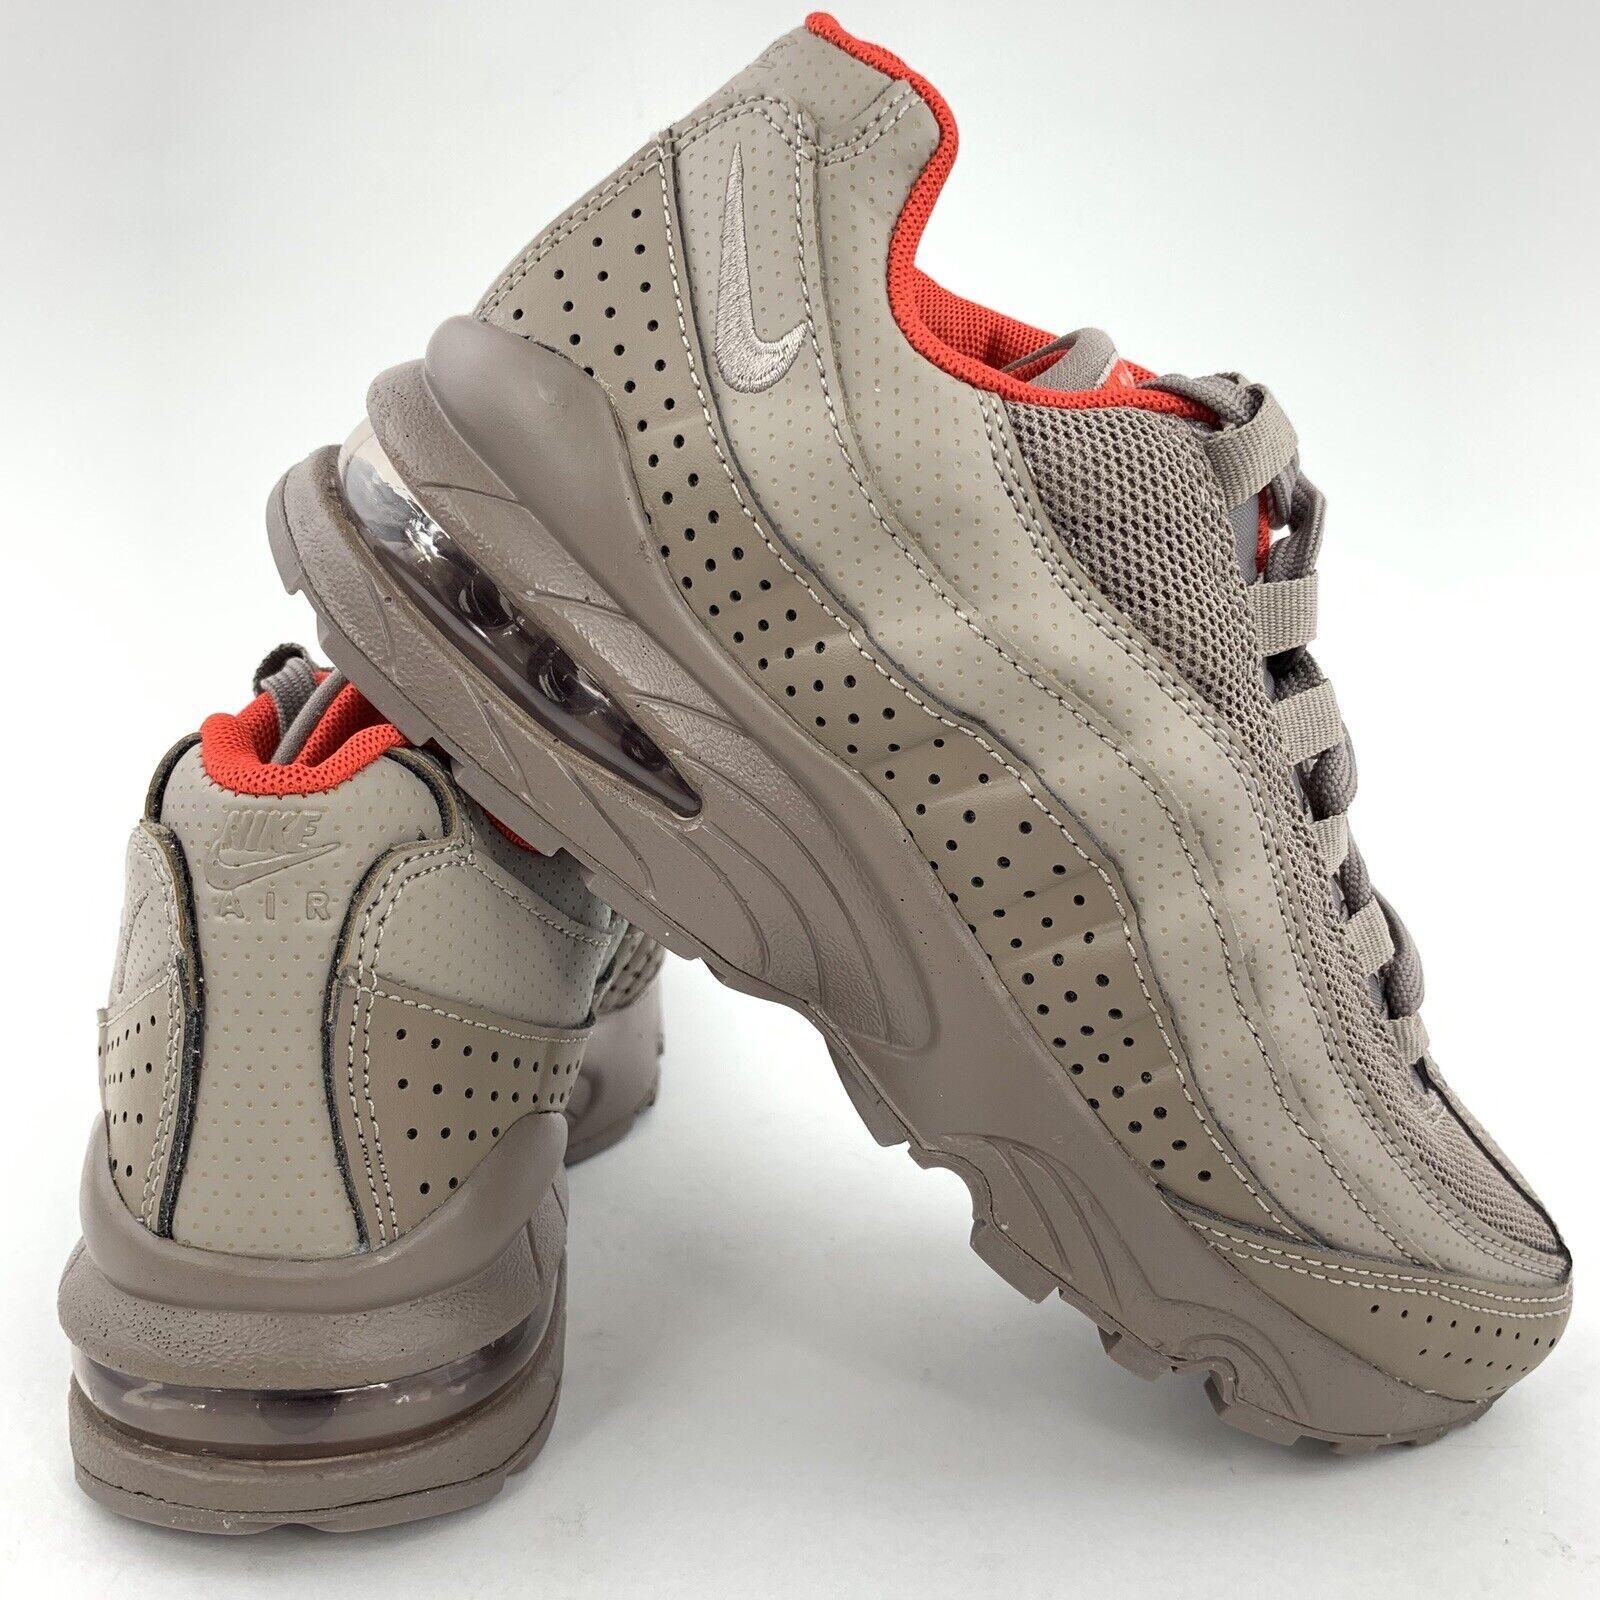 Boys Nike Air Max Shoes 95 GS Size 7 Sepia Stone Orange 922173 200